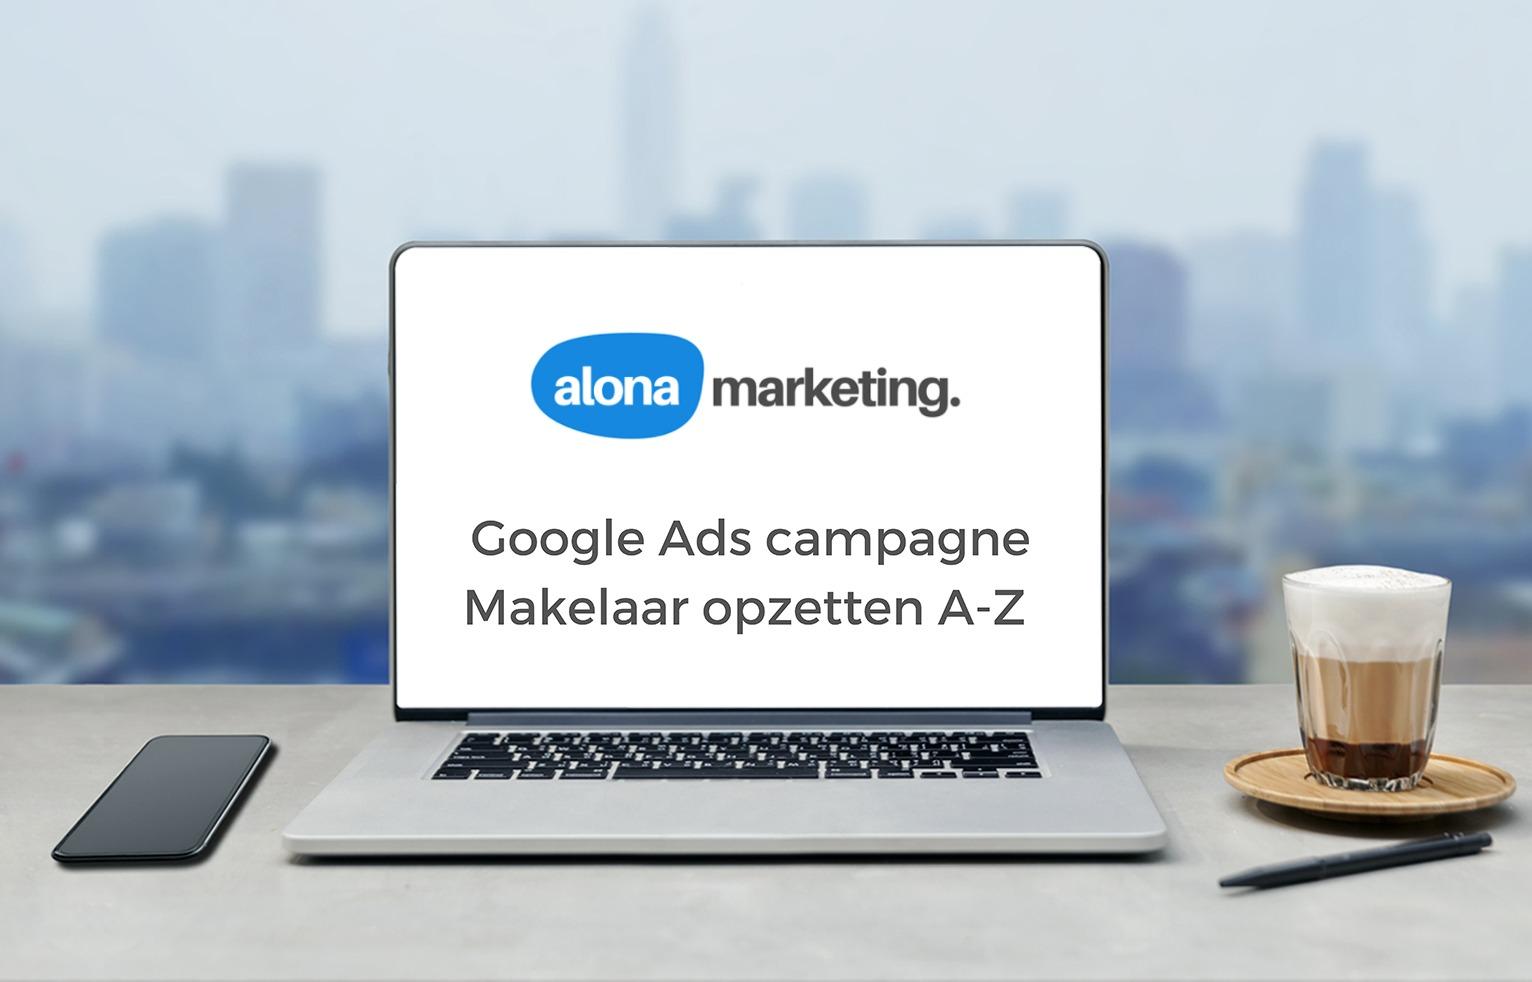 Google Ads campagne makelaar opzetten